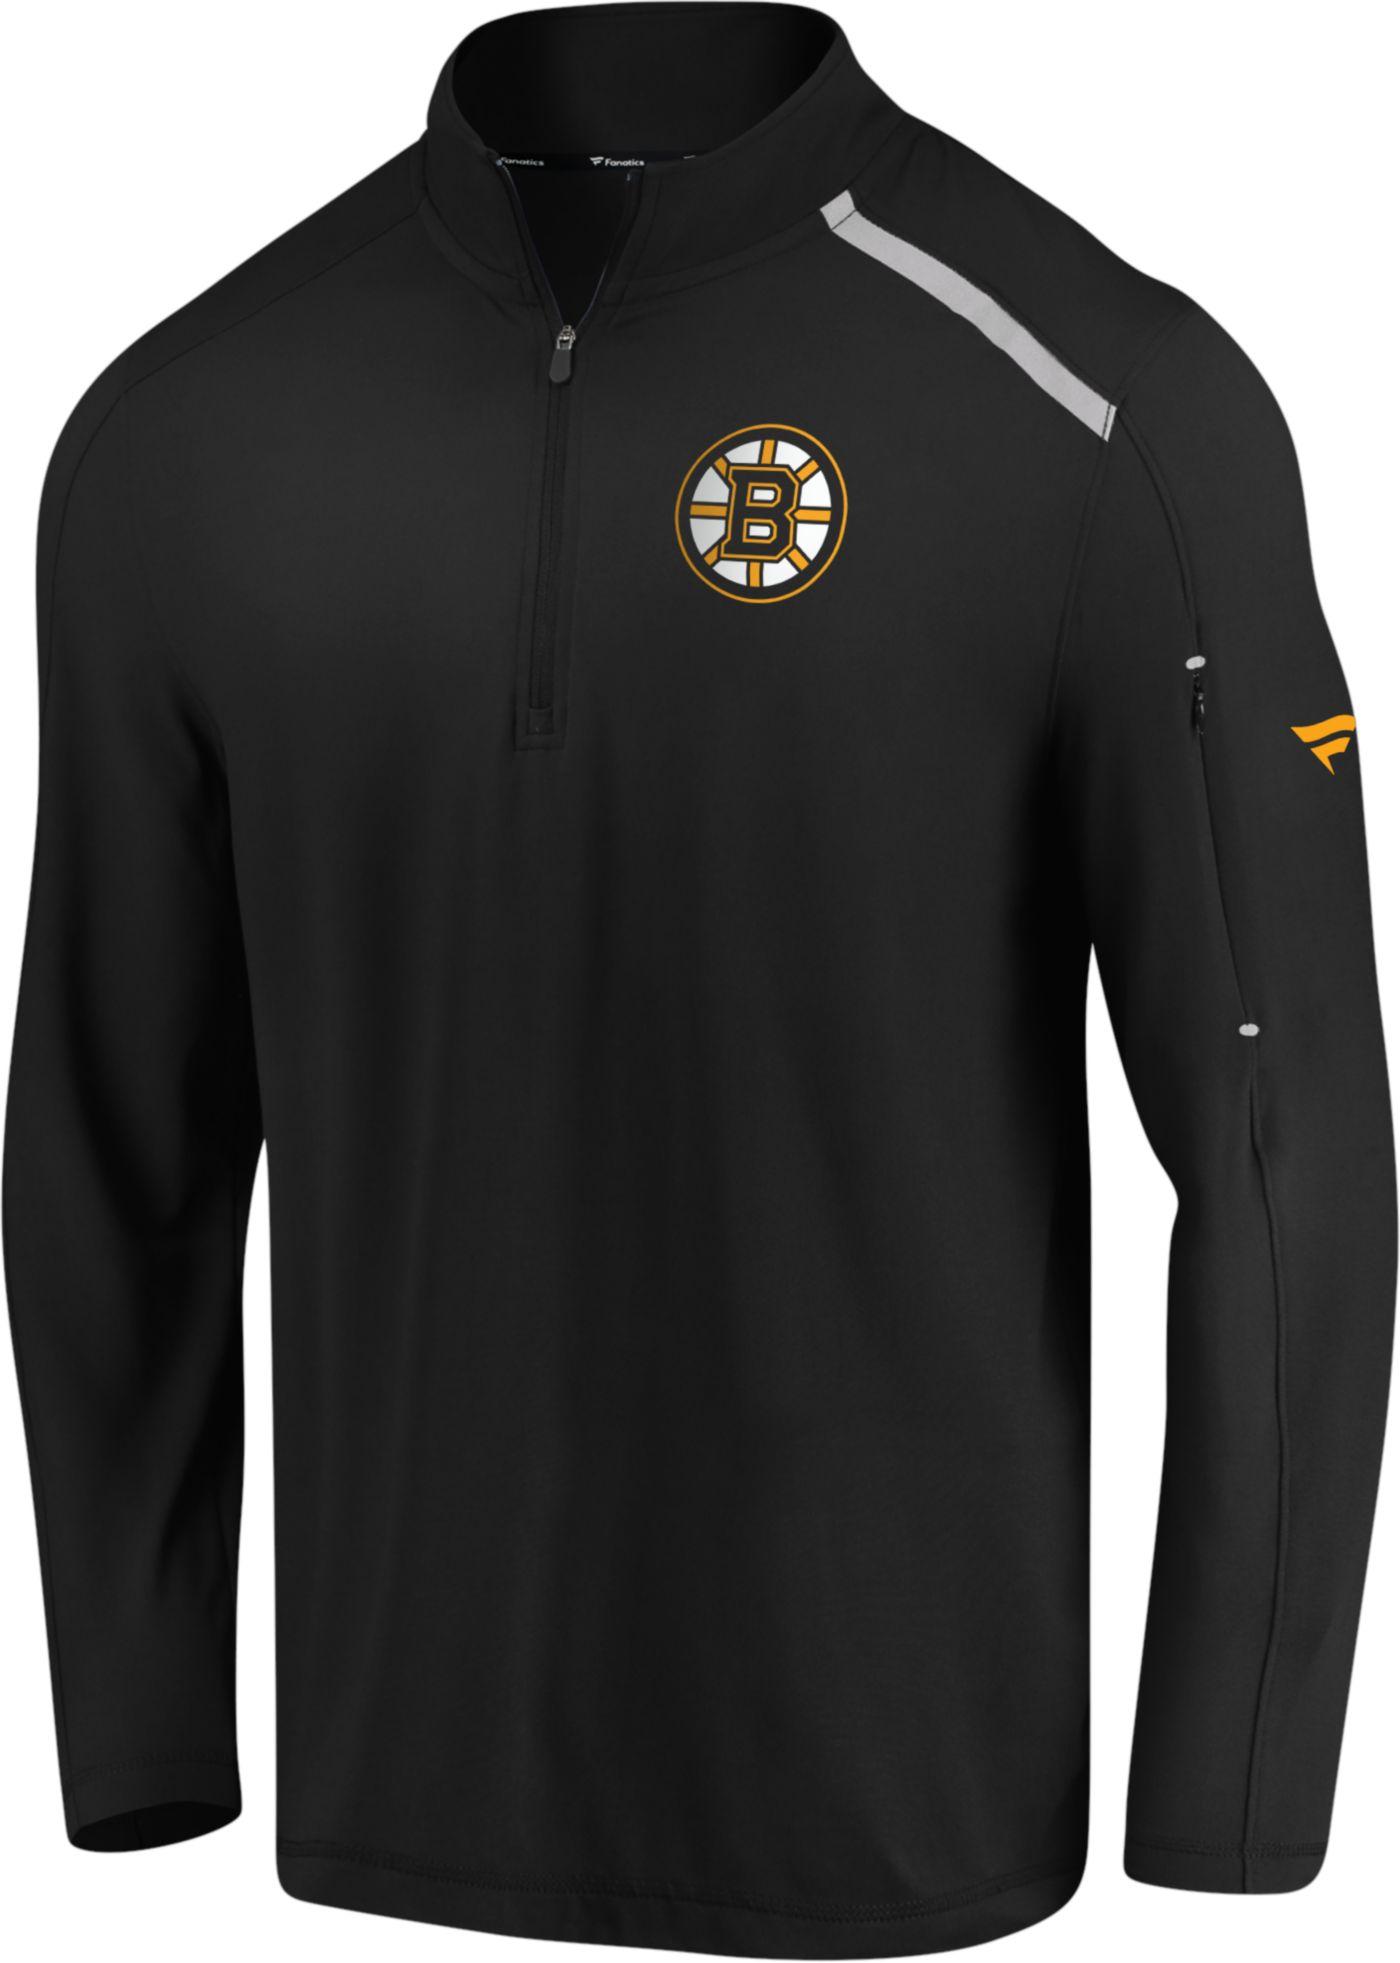 NHL Men's Boston Bruins Authentic Pro Clutch Black Quarter-Zip Pullover